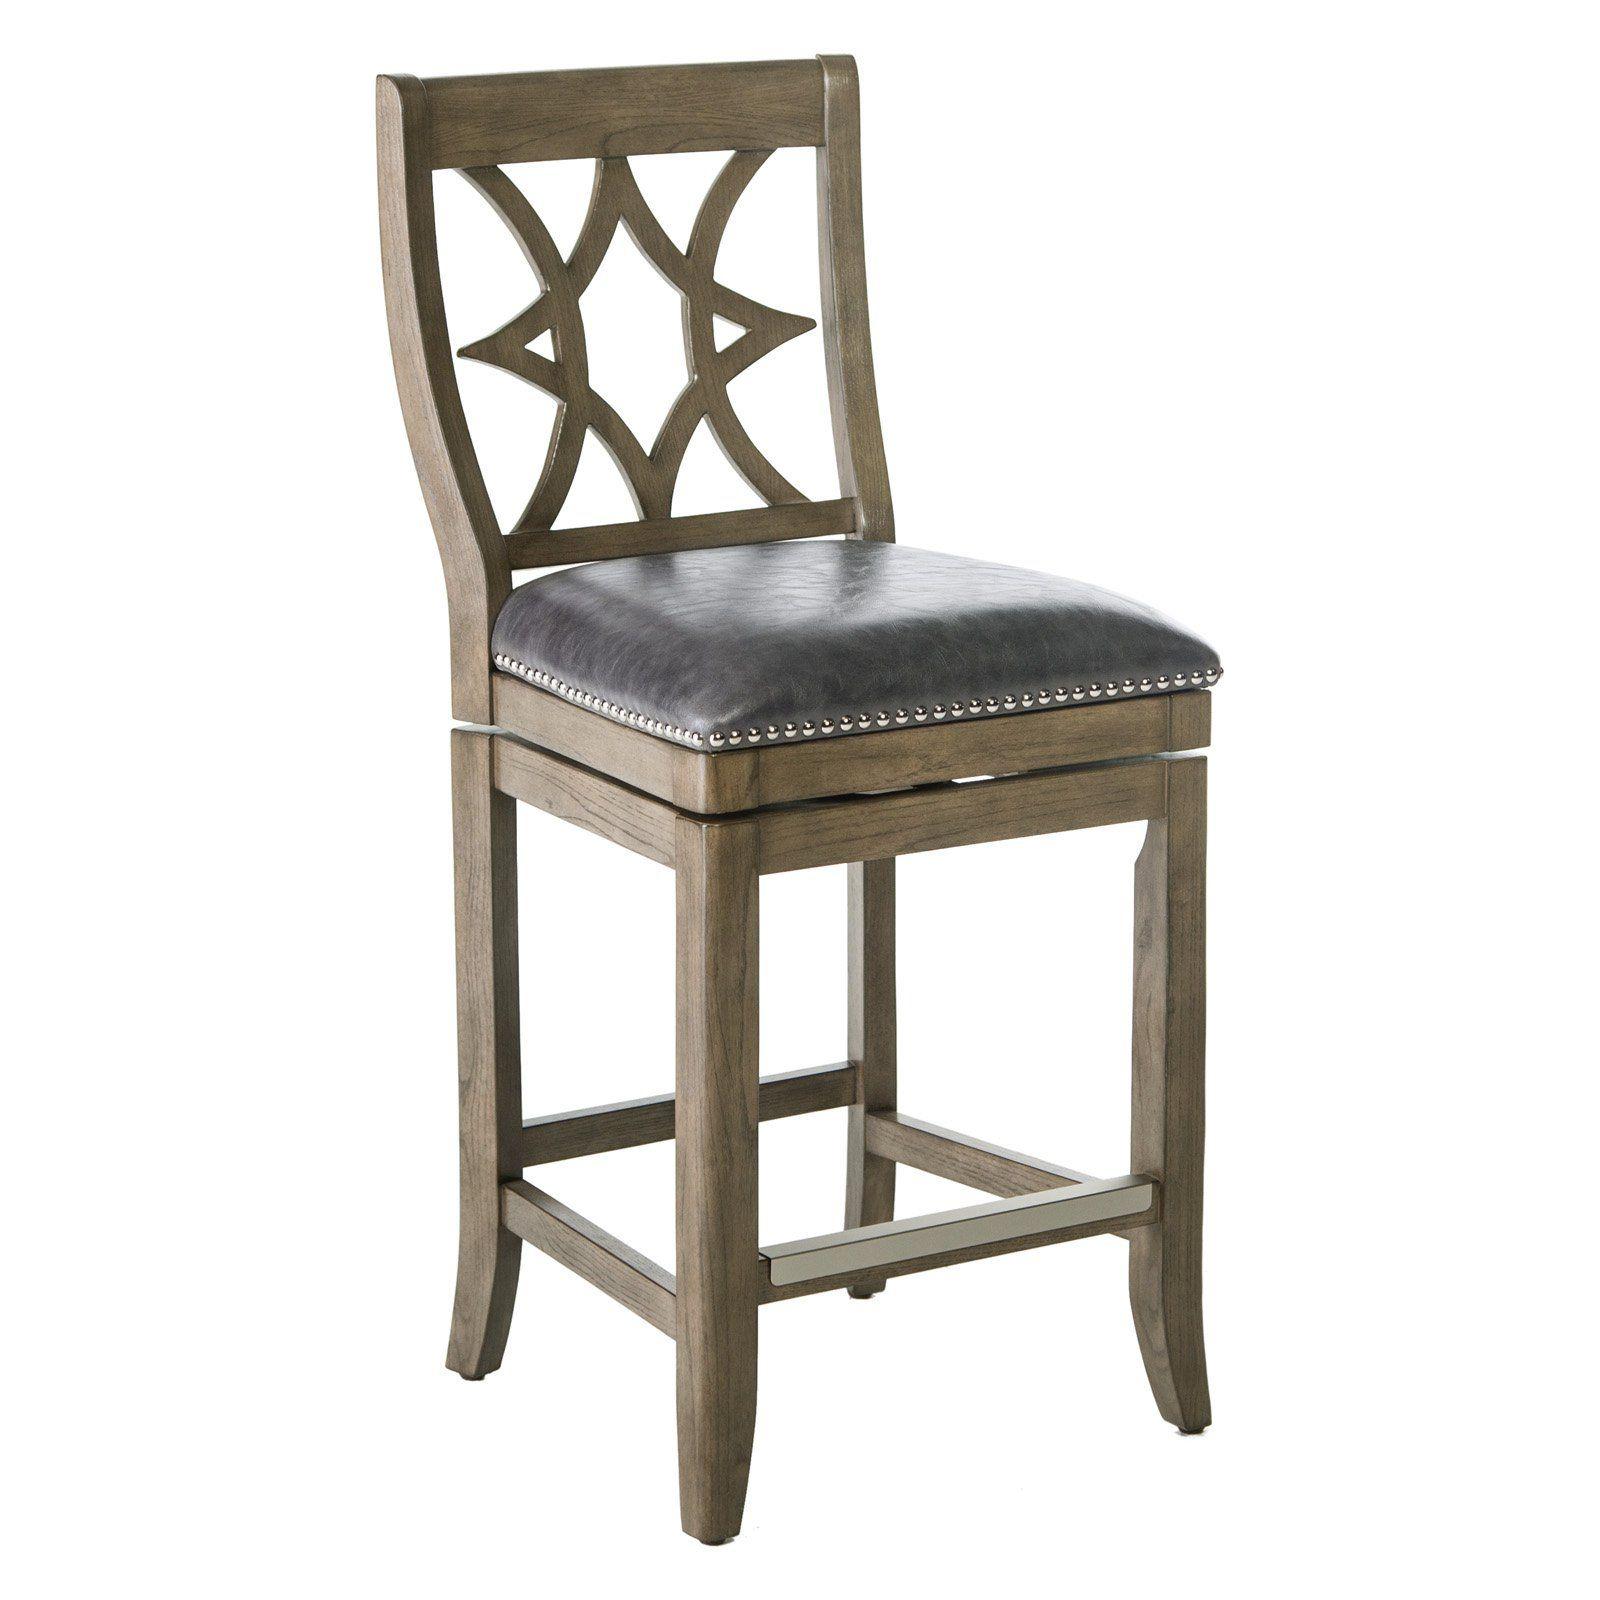 Belham living oliver square seat swivel counter stool in